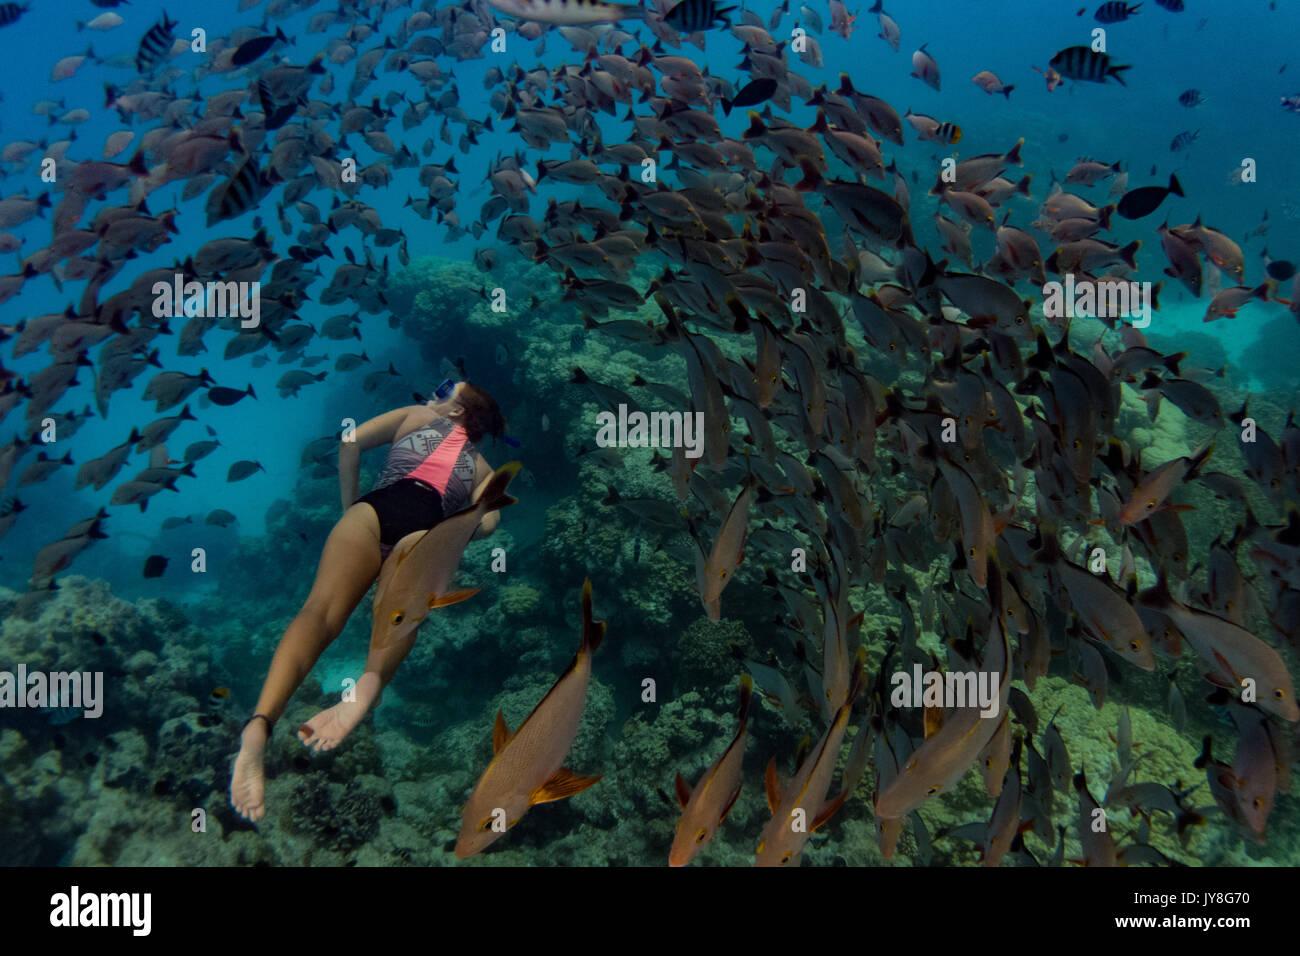 A snorkeler enjoying the massive schools of fish at Rangiroa atoll, French Polynesia - Stock Image